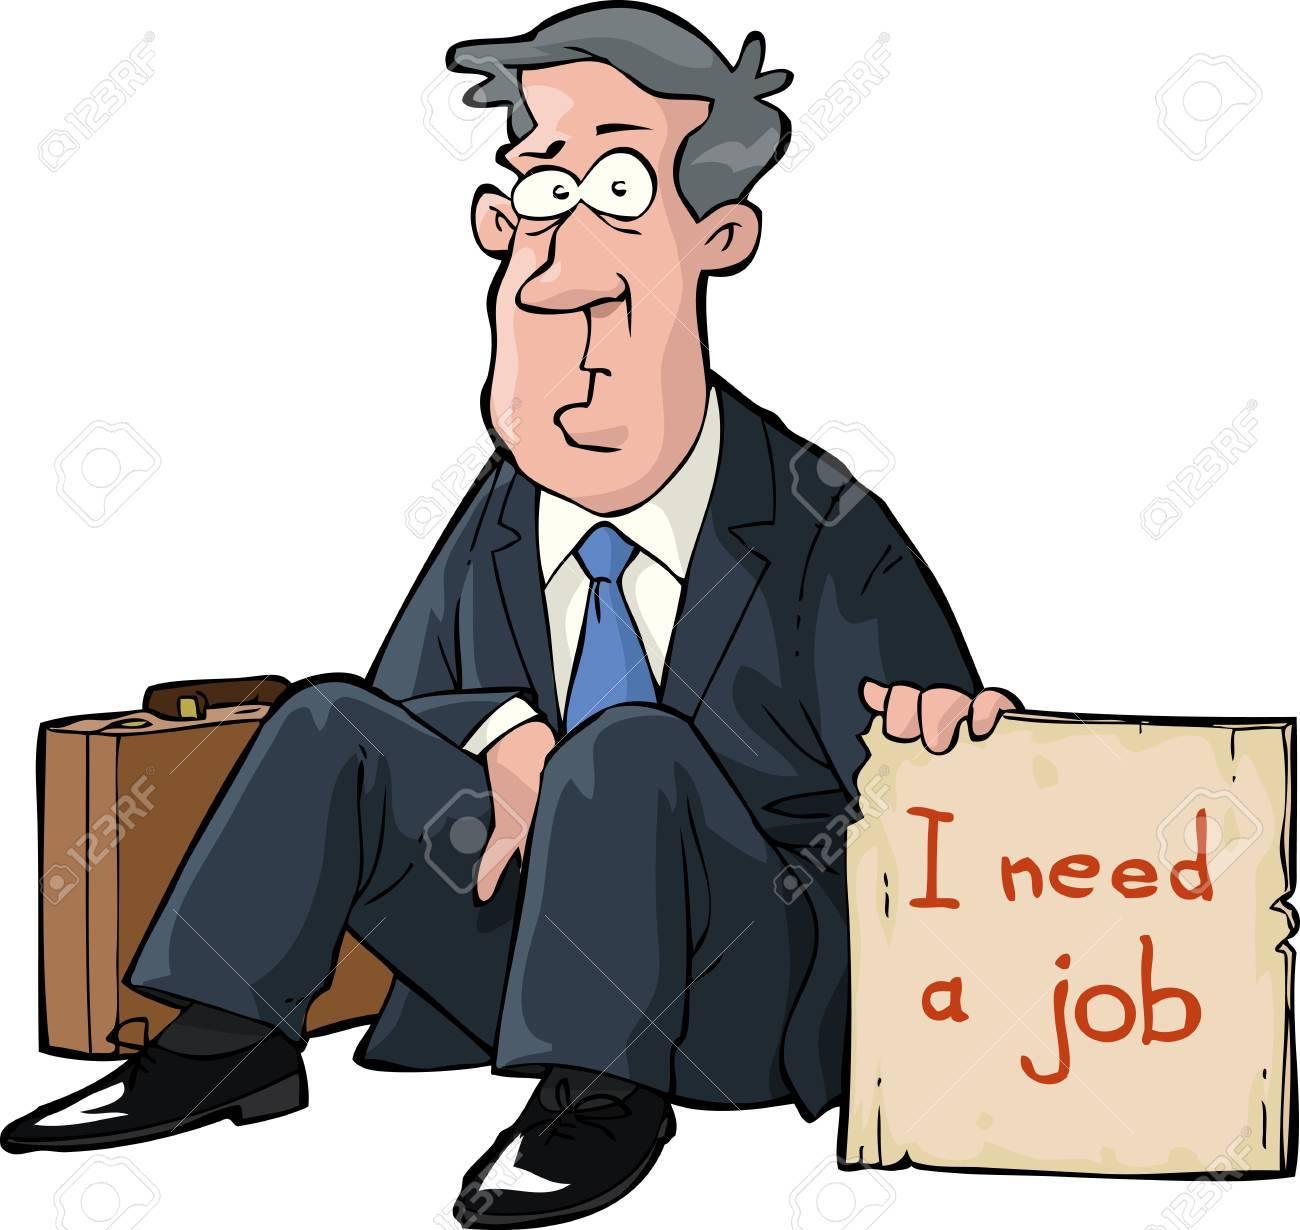 A man needs a job Stock Vector - 20679327